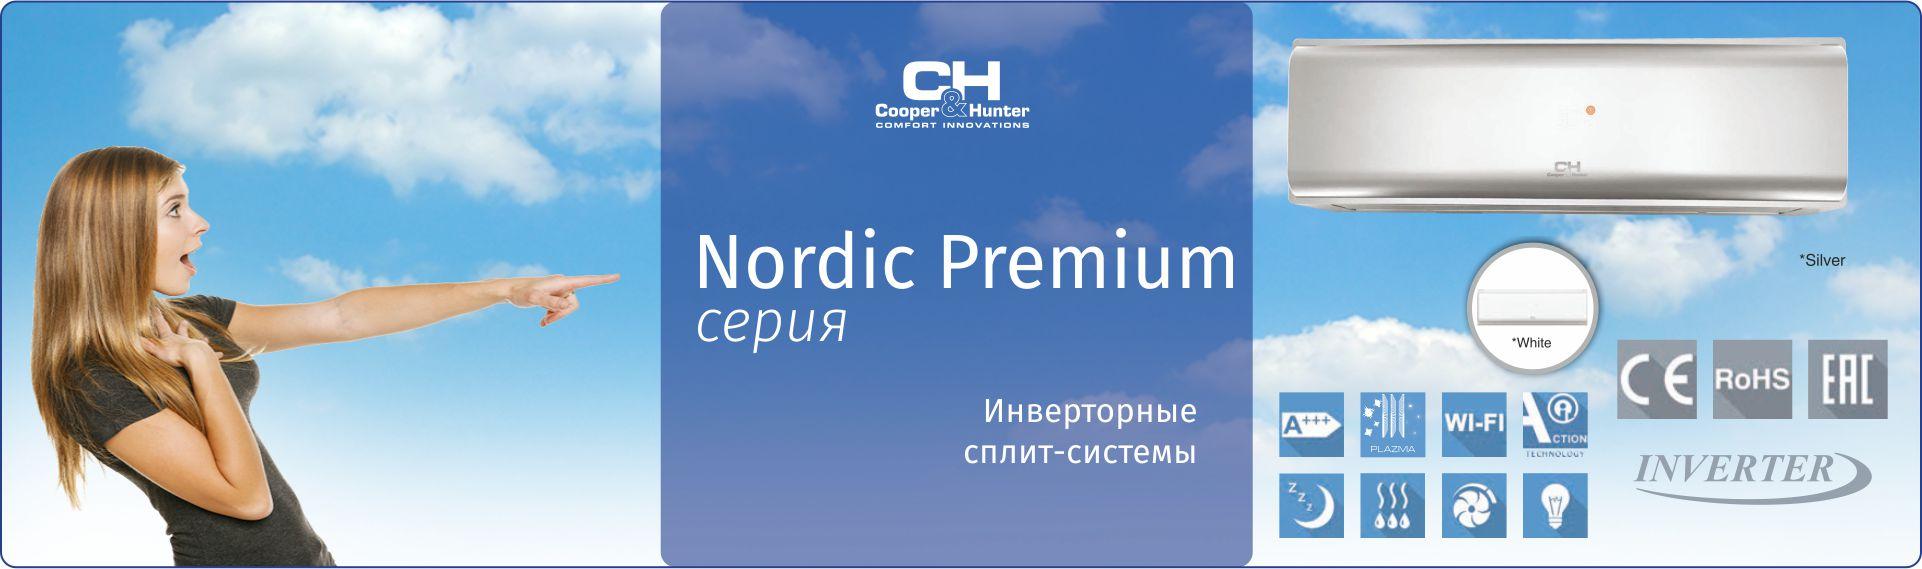 Серия NORDIC PREMIUM (Silver)